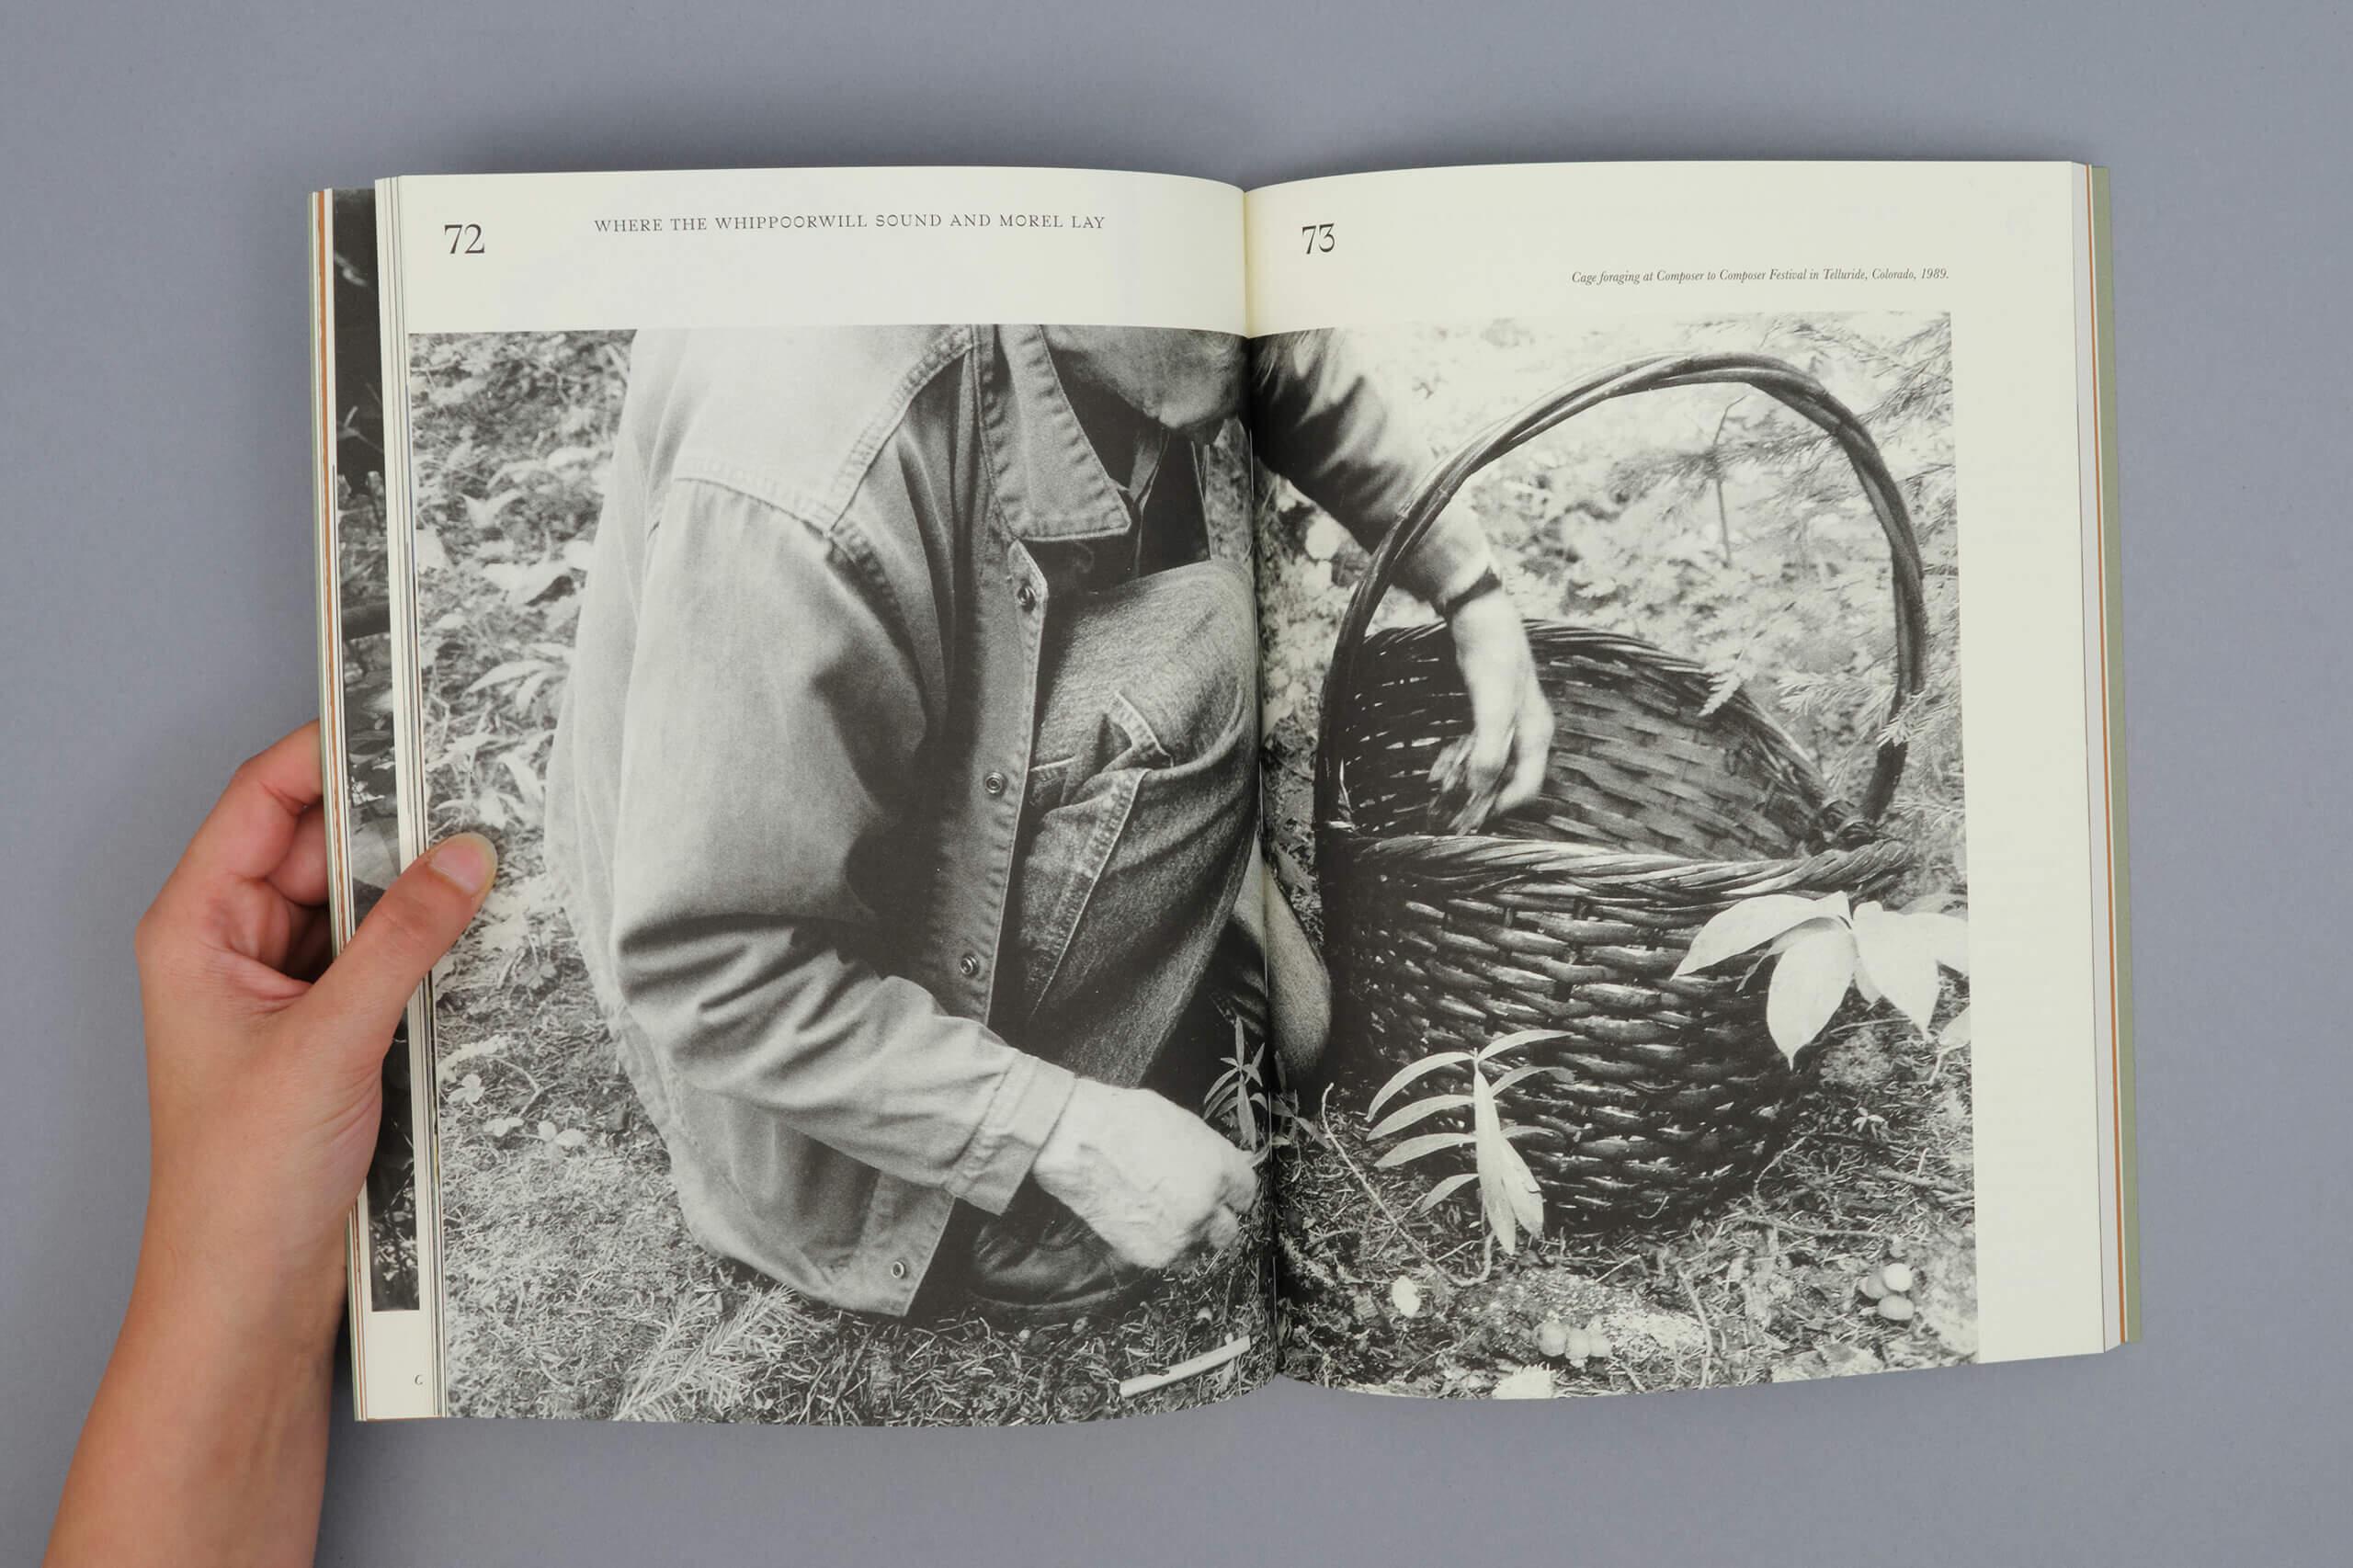 john-cage-mycological-delpire3